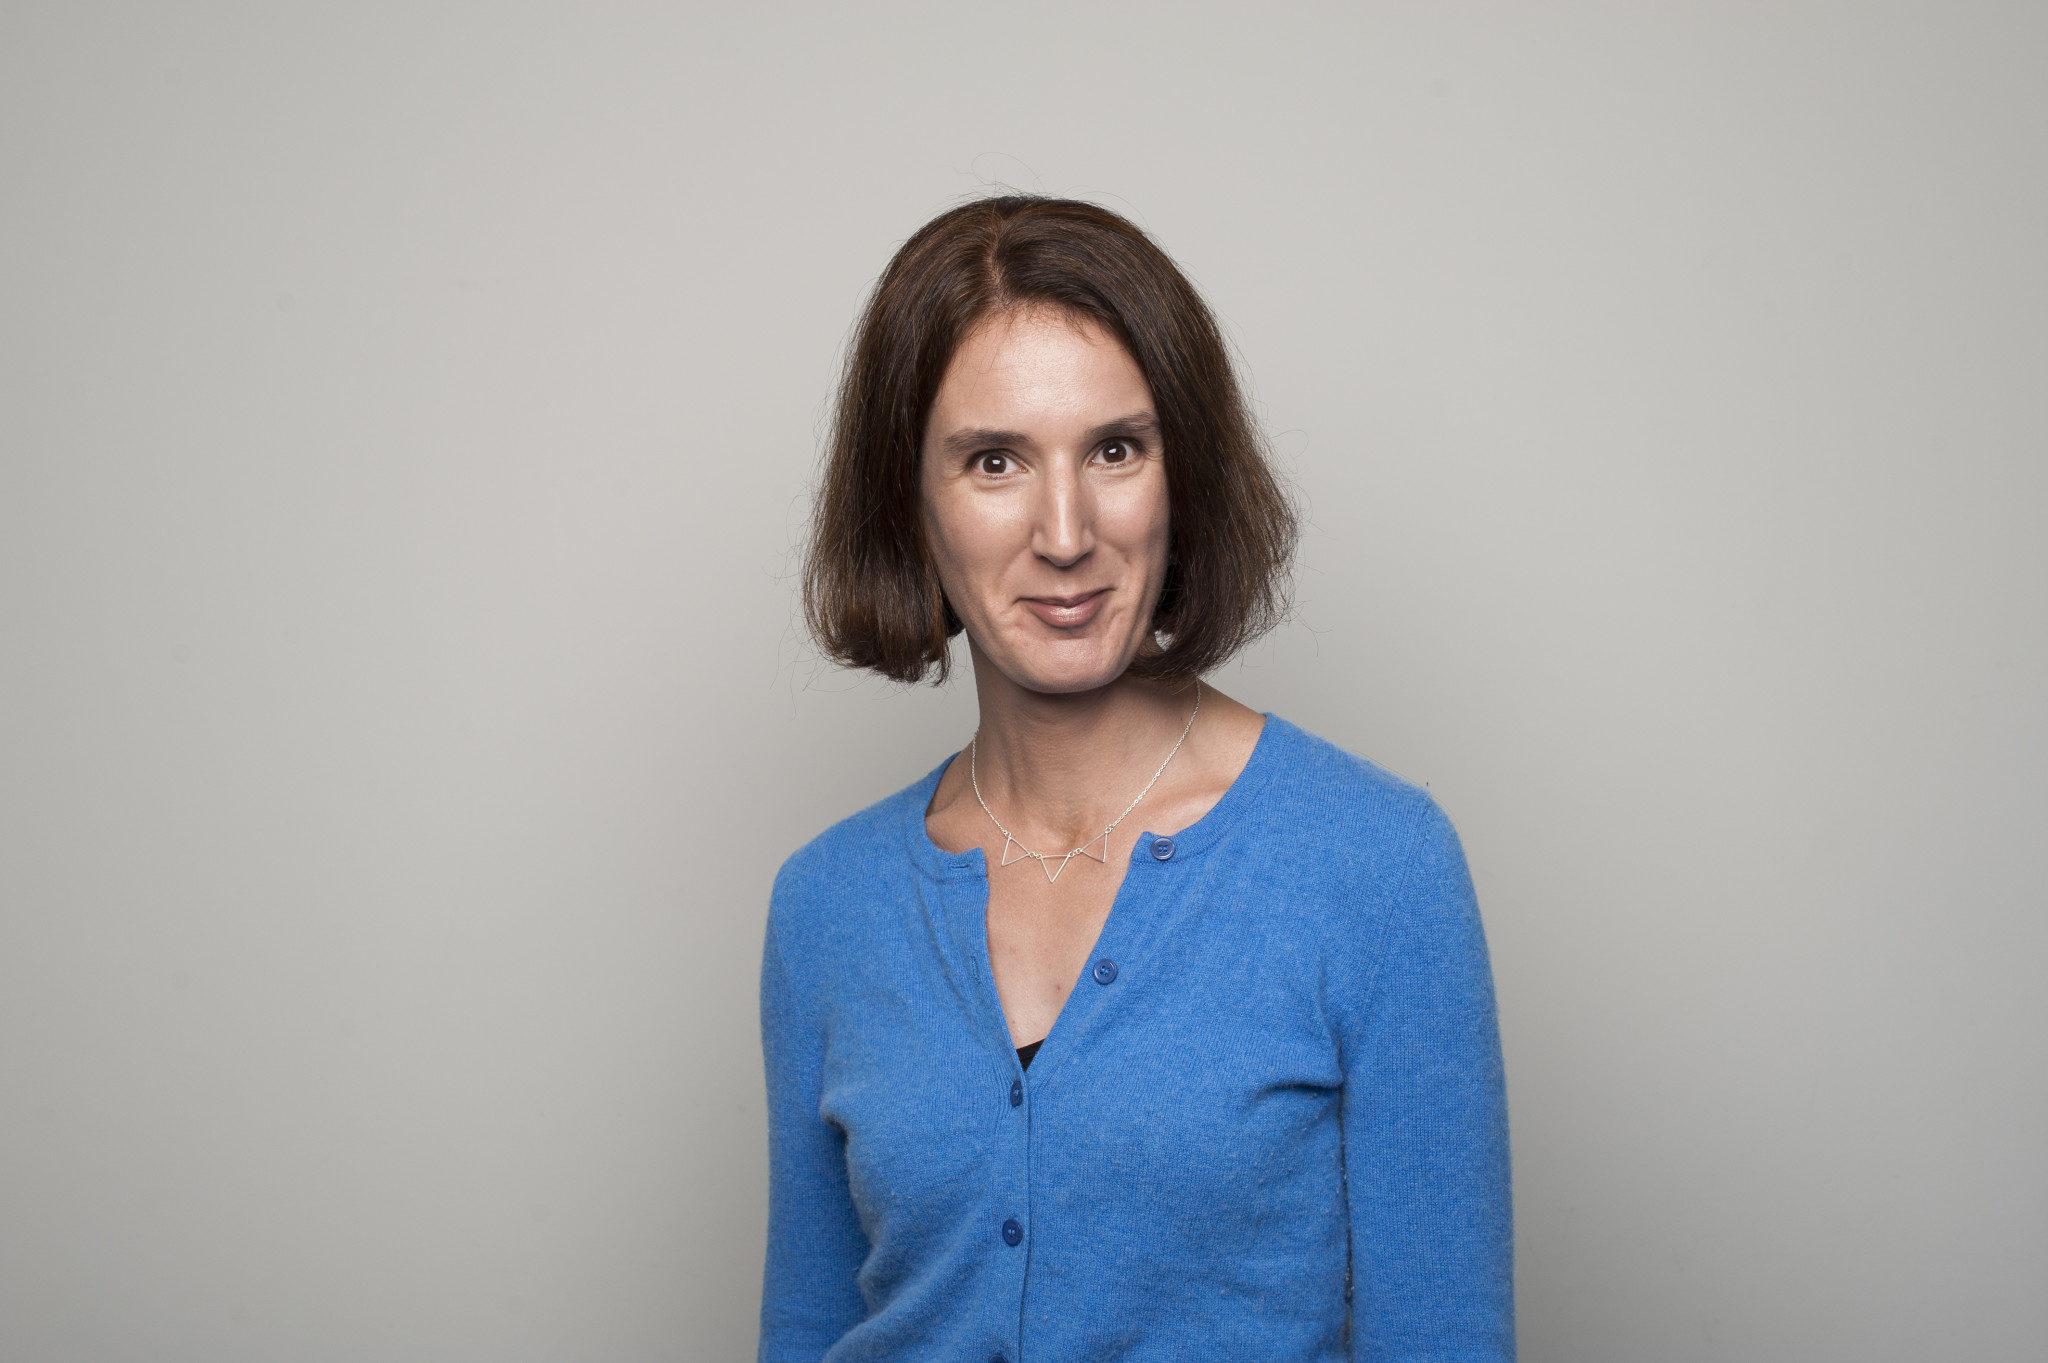 Lise Wagner experte en accessibilité